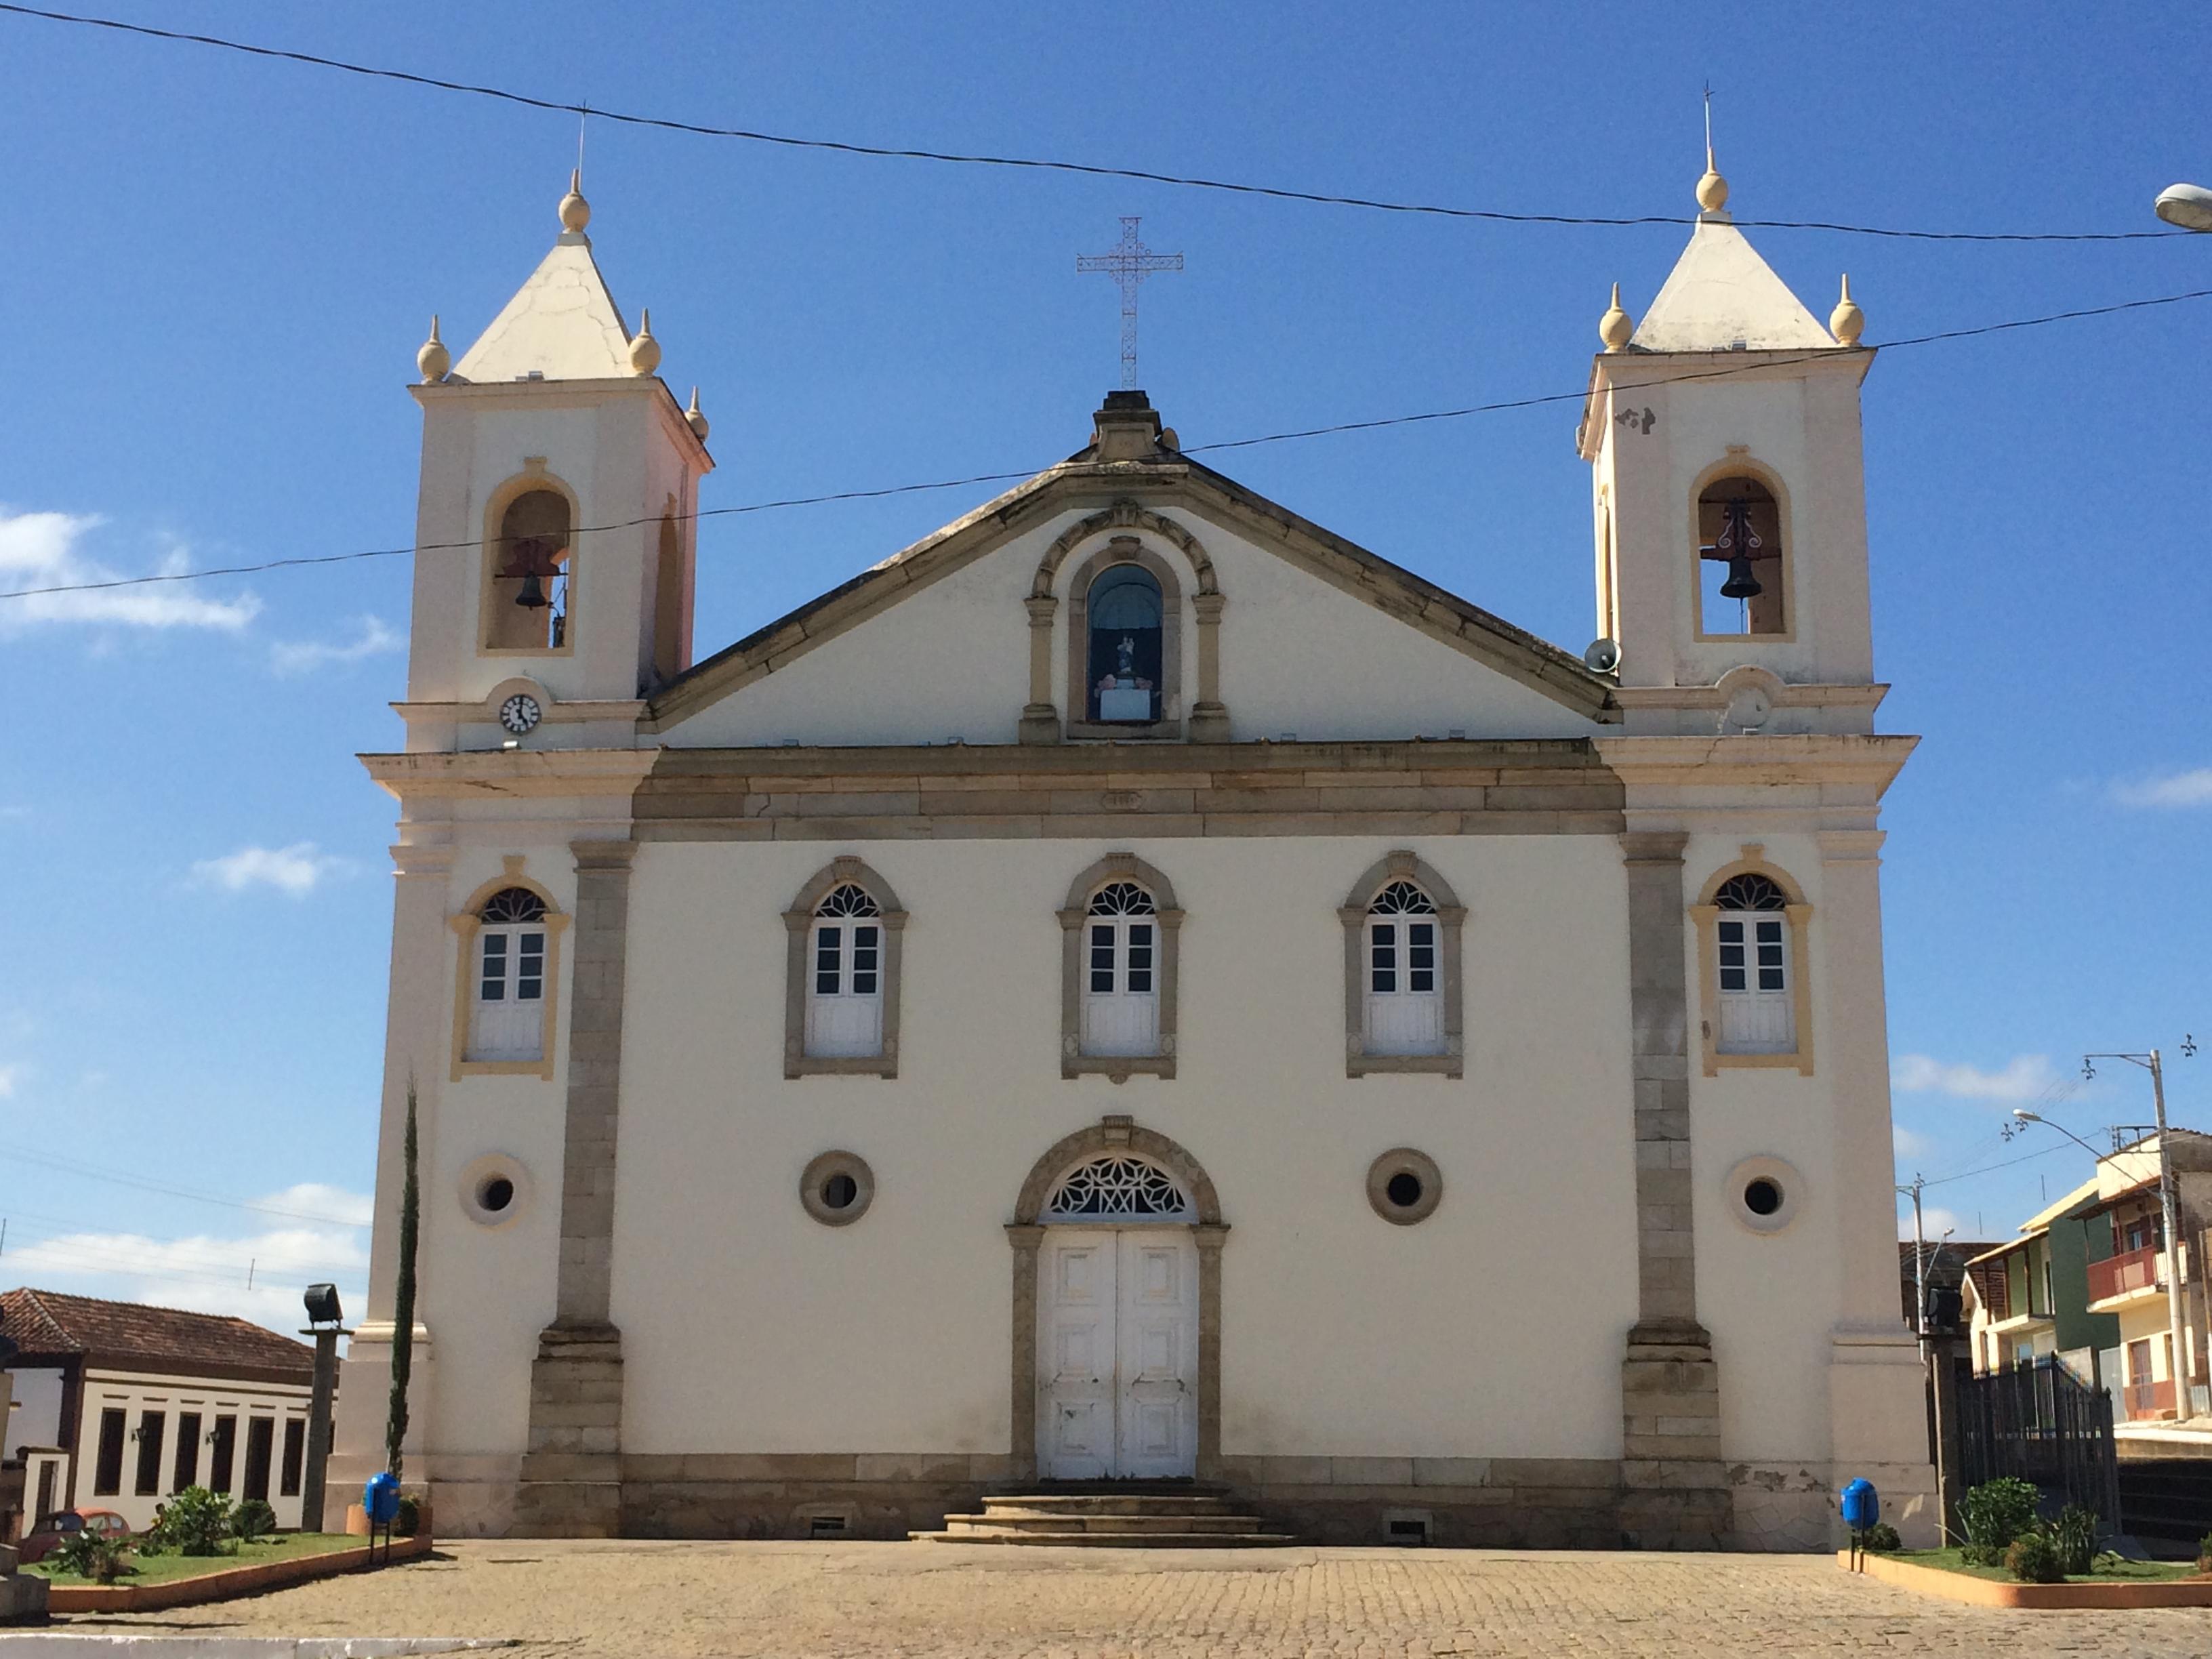 Nazareno Minas Gerais fonte: upload.wikimedia.org